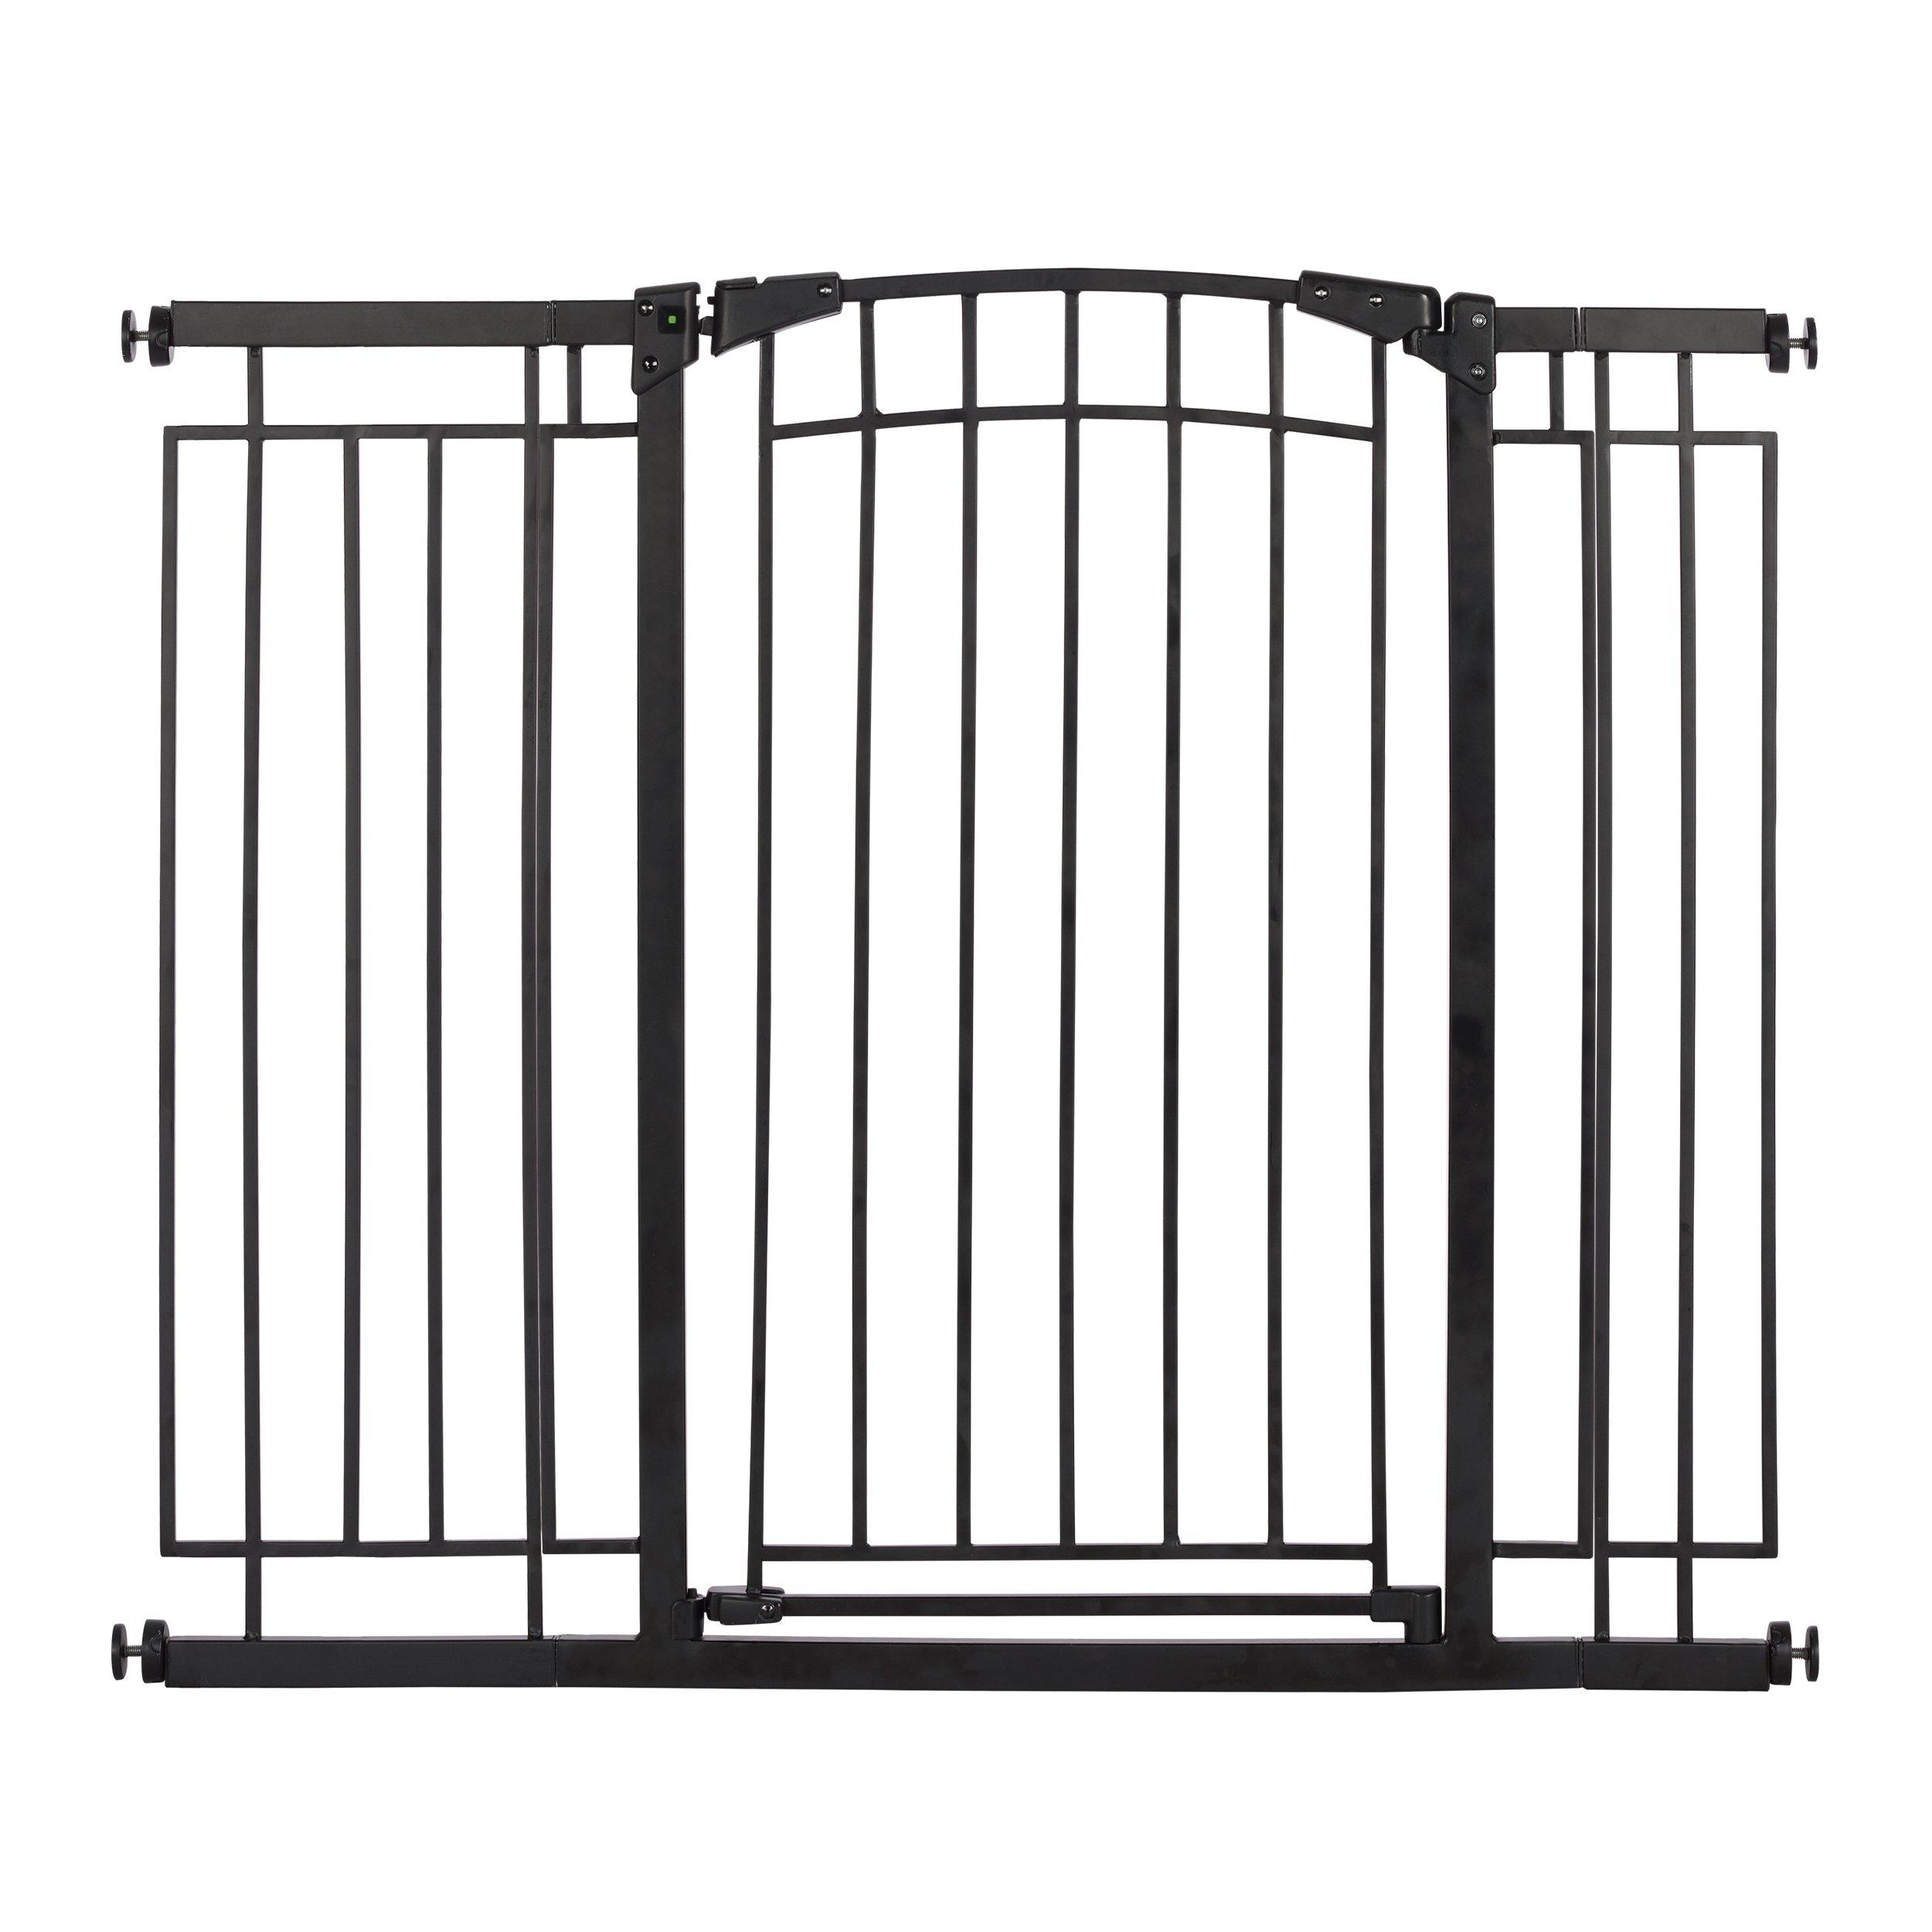 Evenflo Multi-Use Decor Tall Walk-Thru Gate, Black Metal by Evenflo